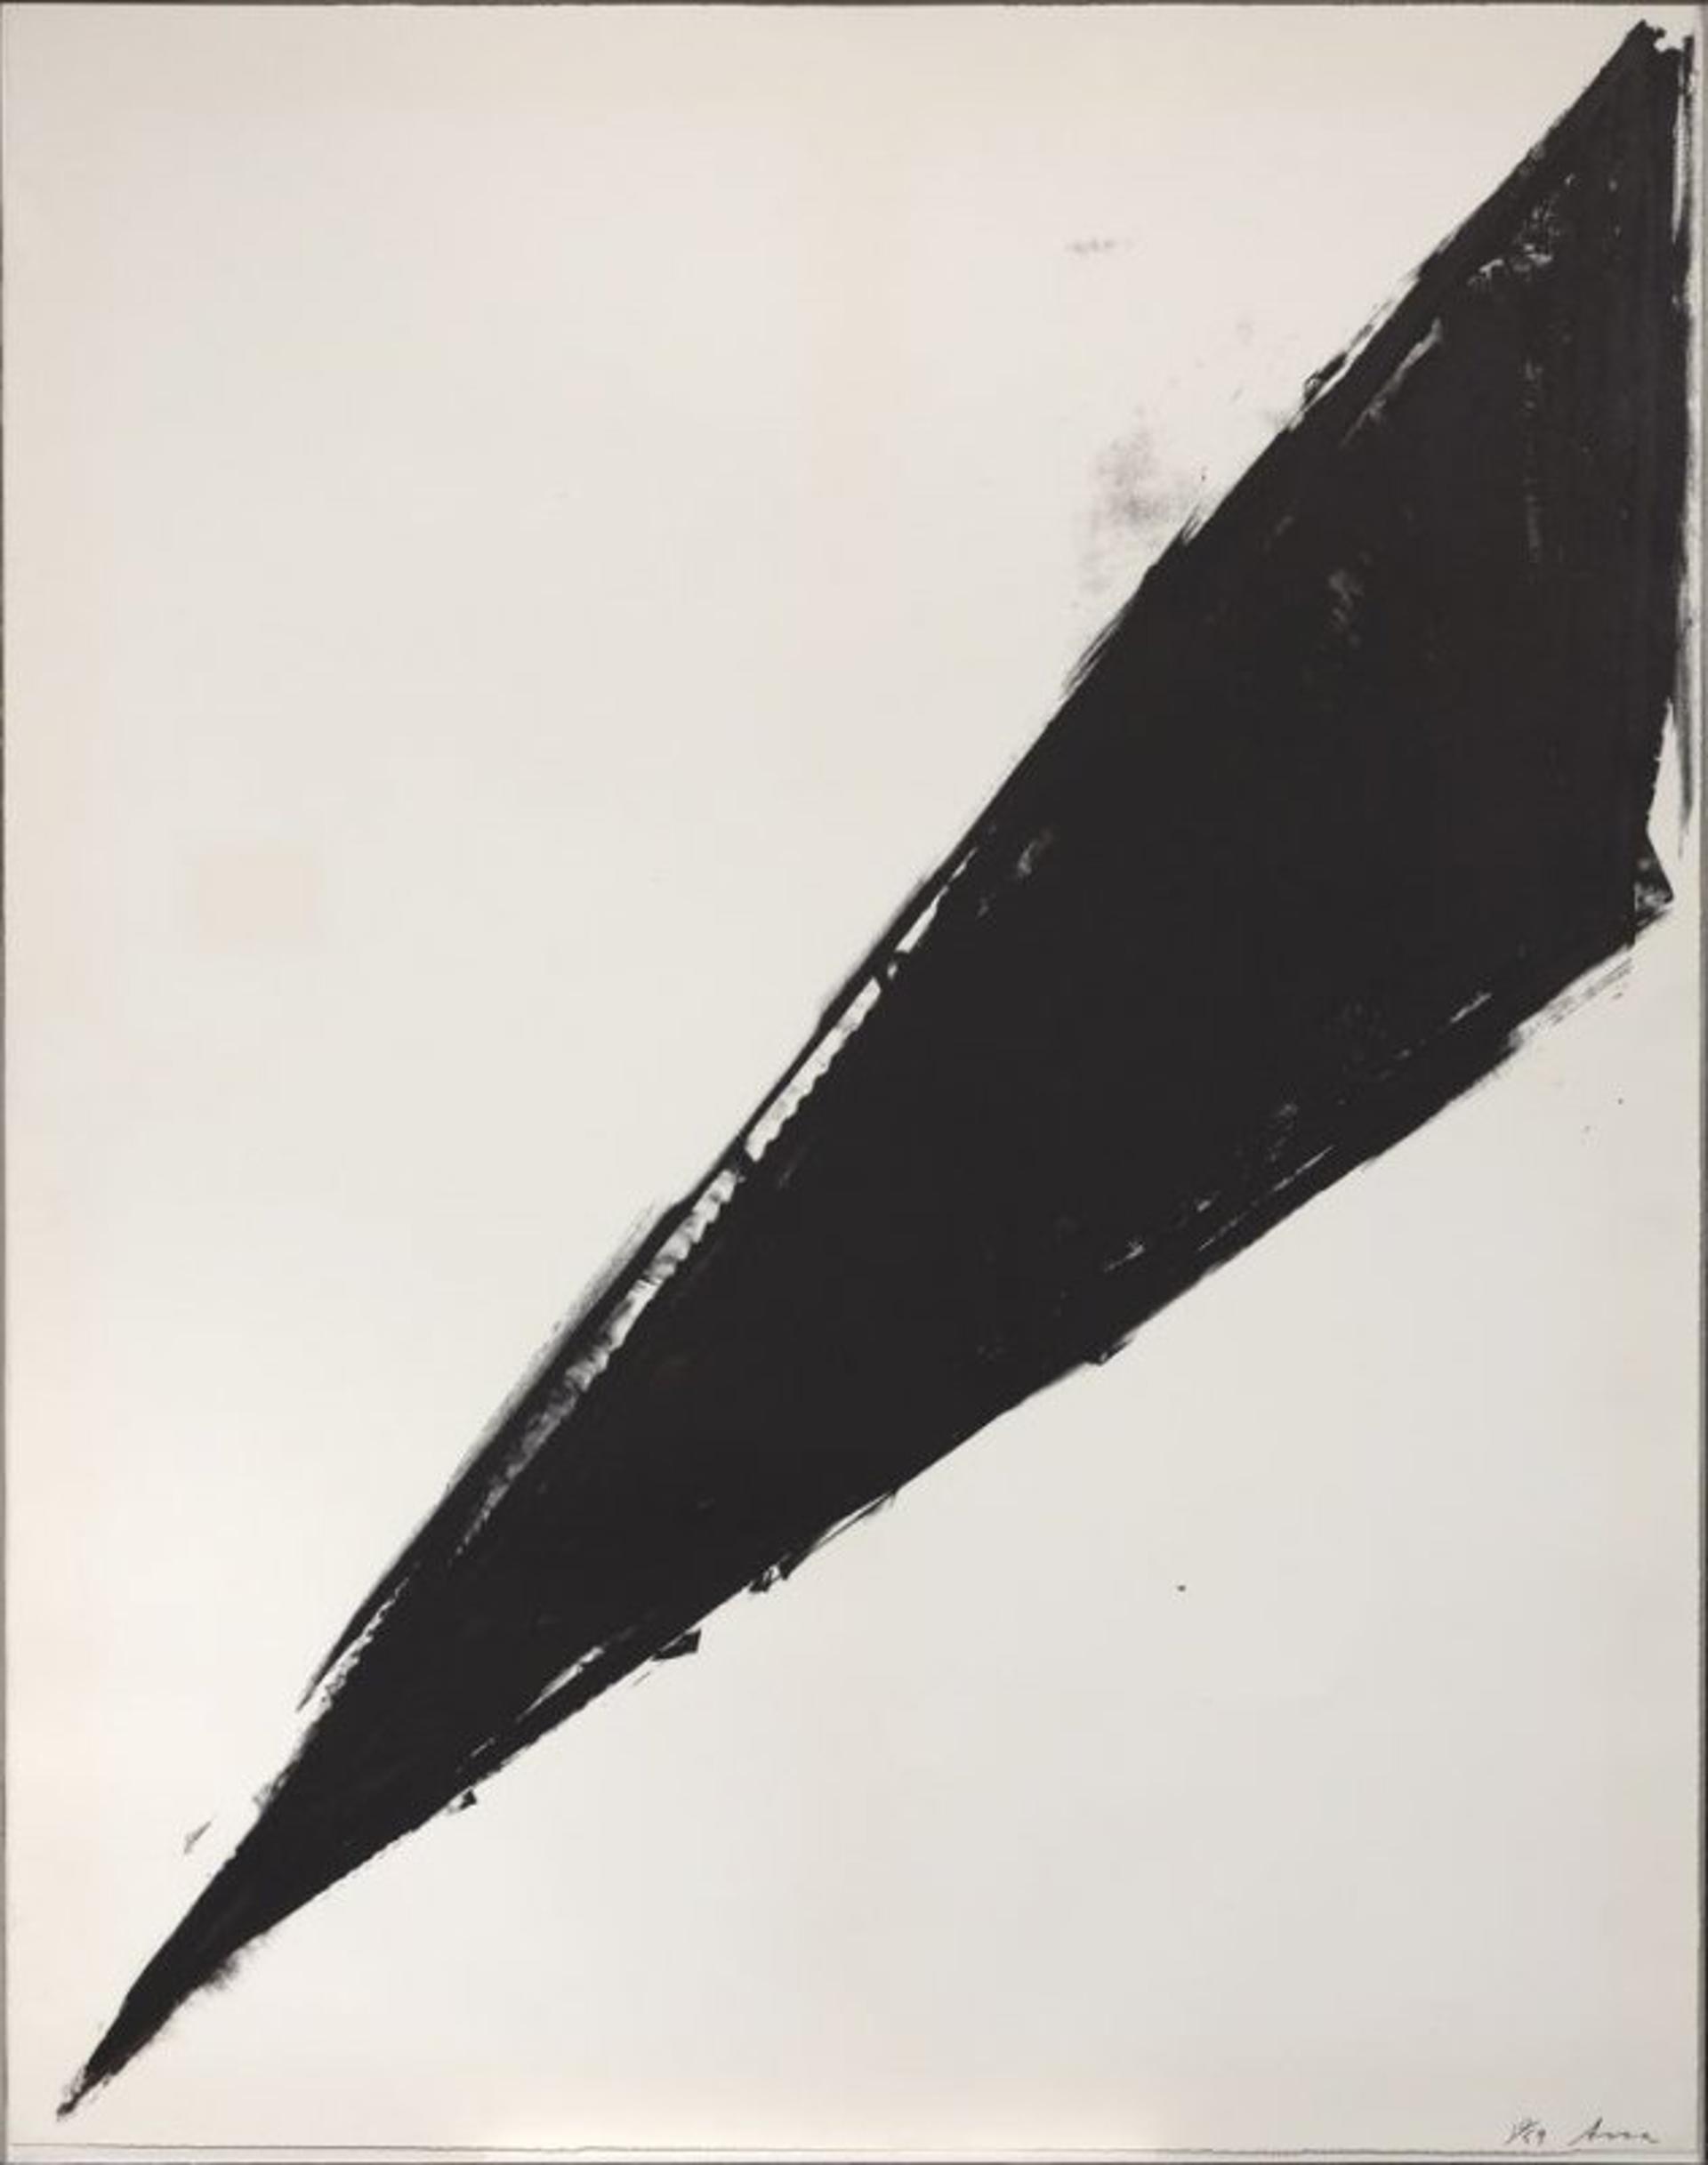 Du Common by Richard Serra